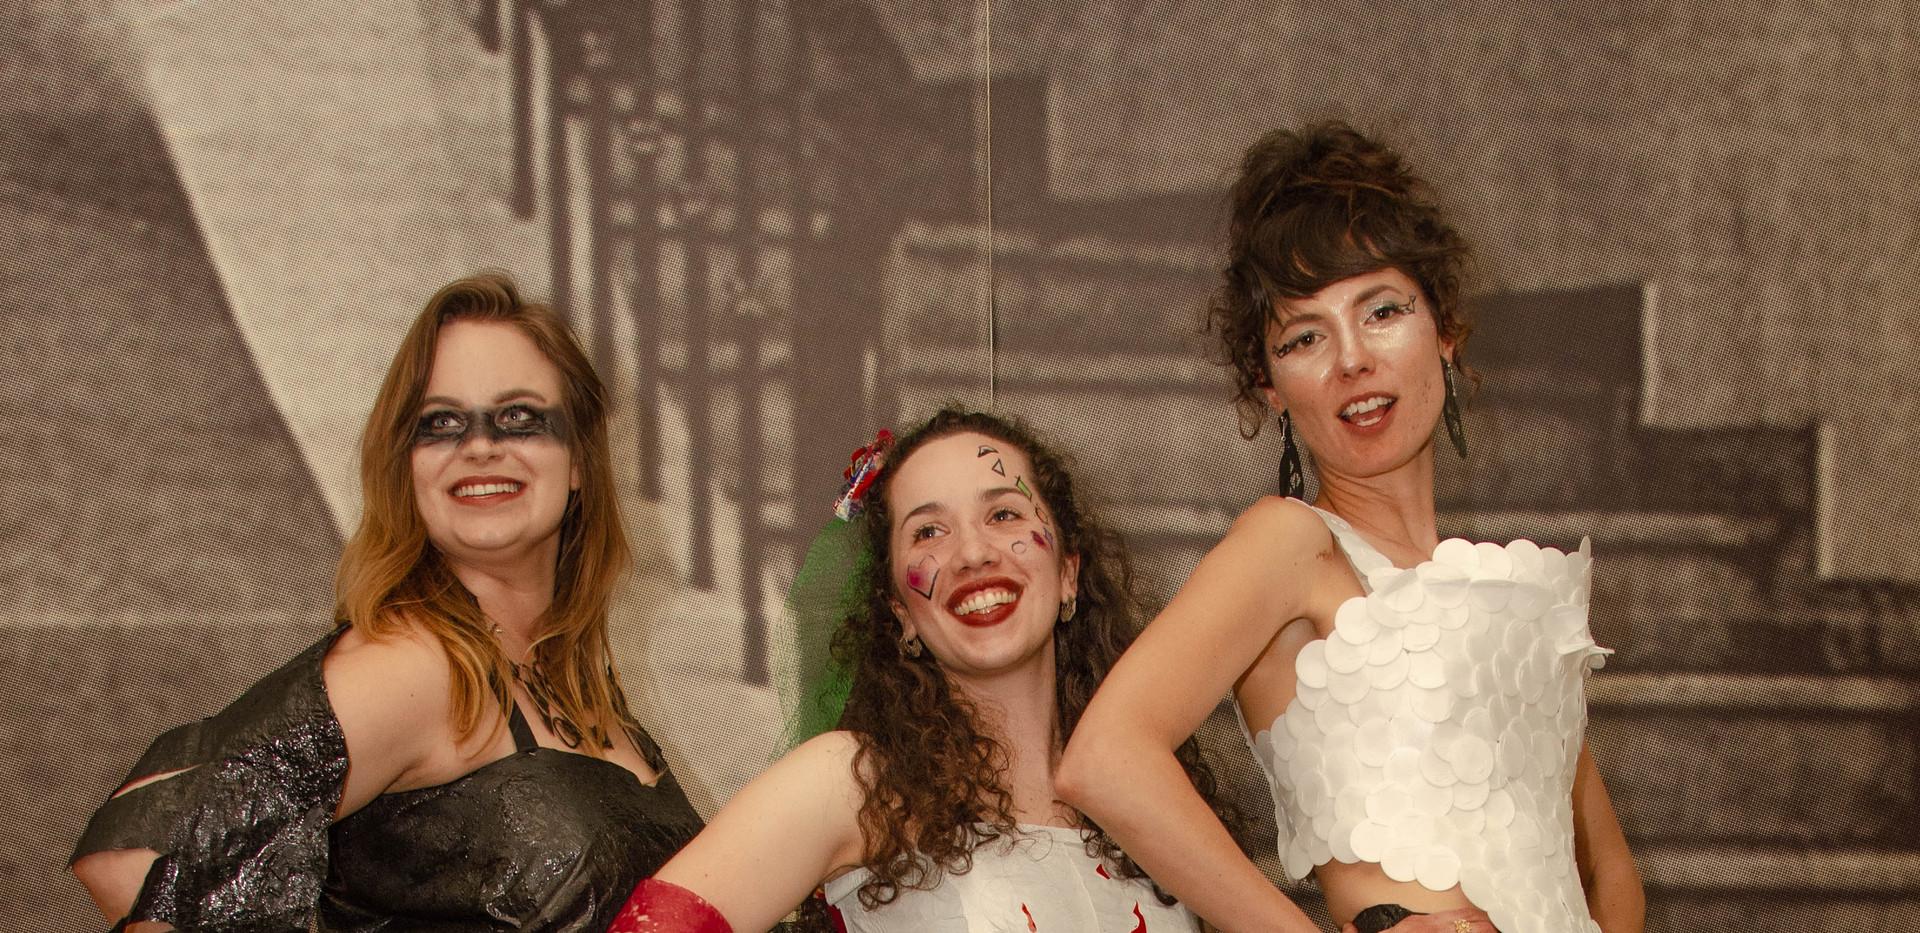 Erin, Rose, Asha in Costume